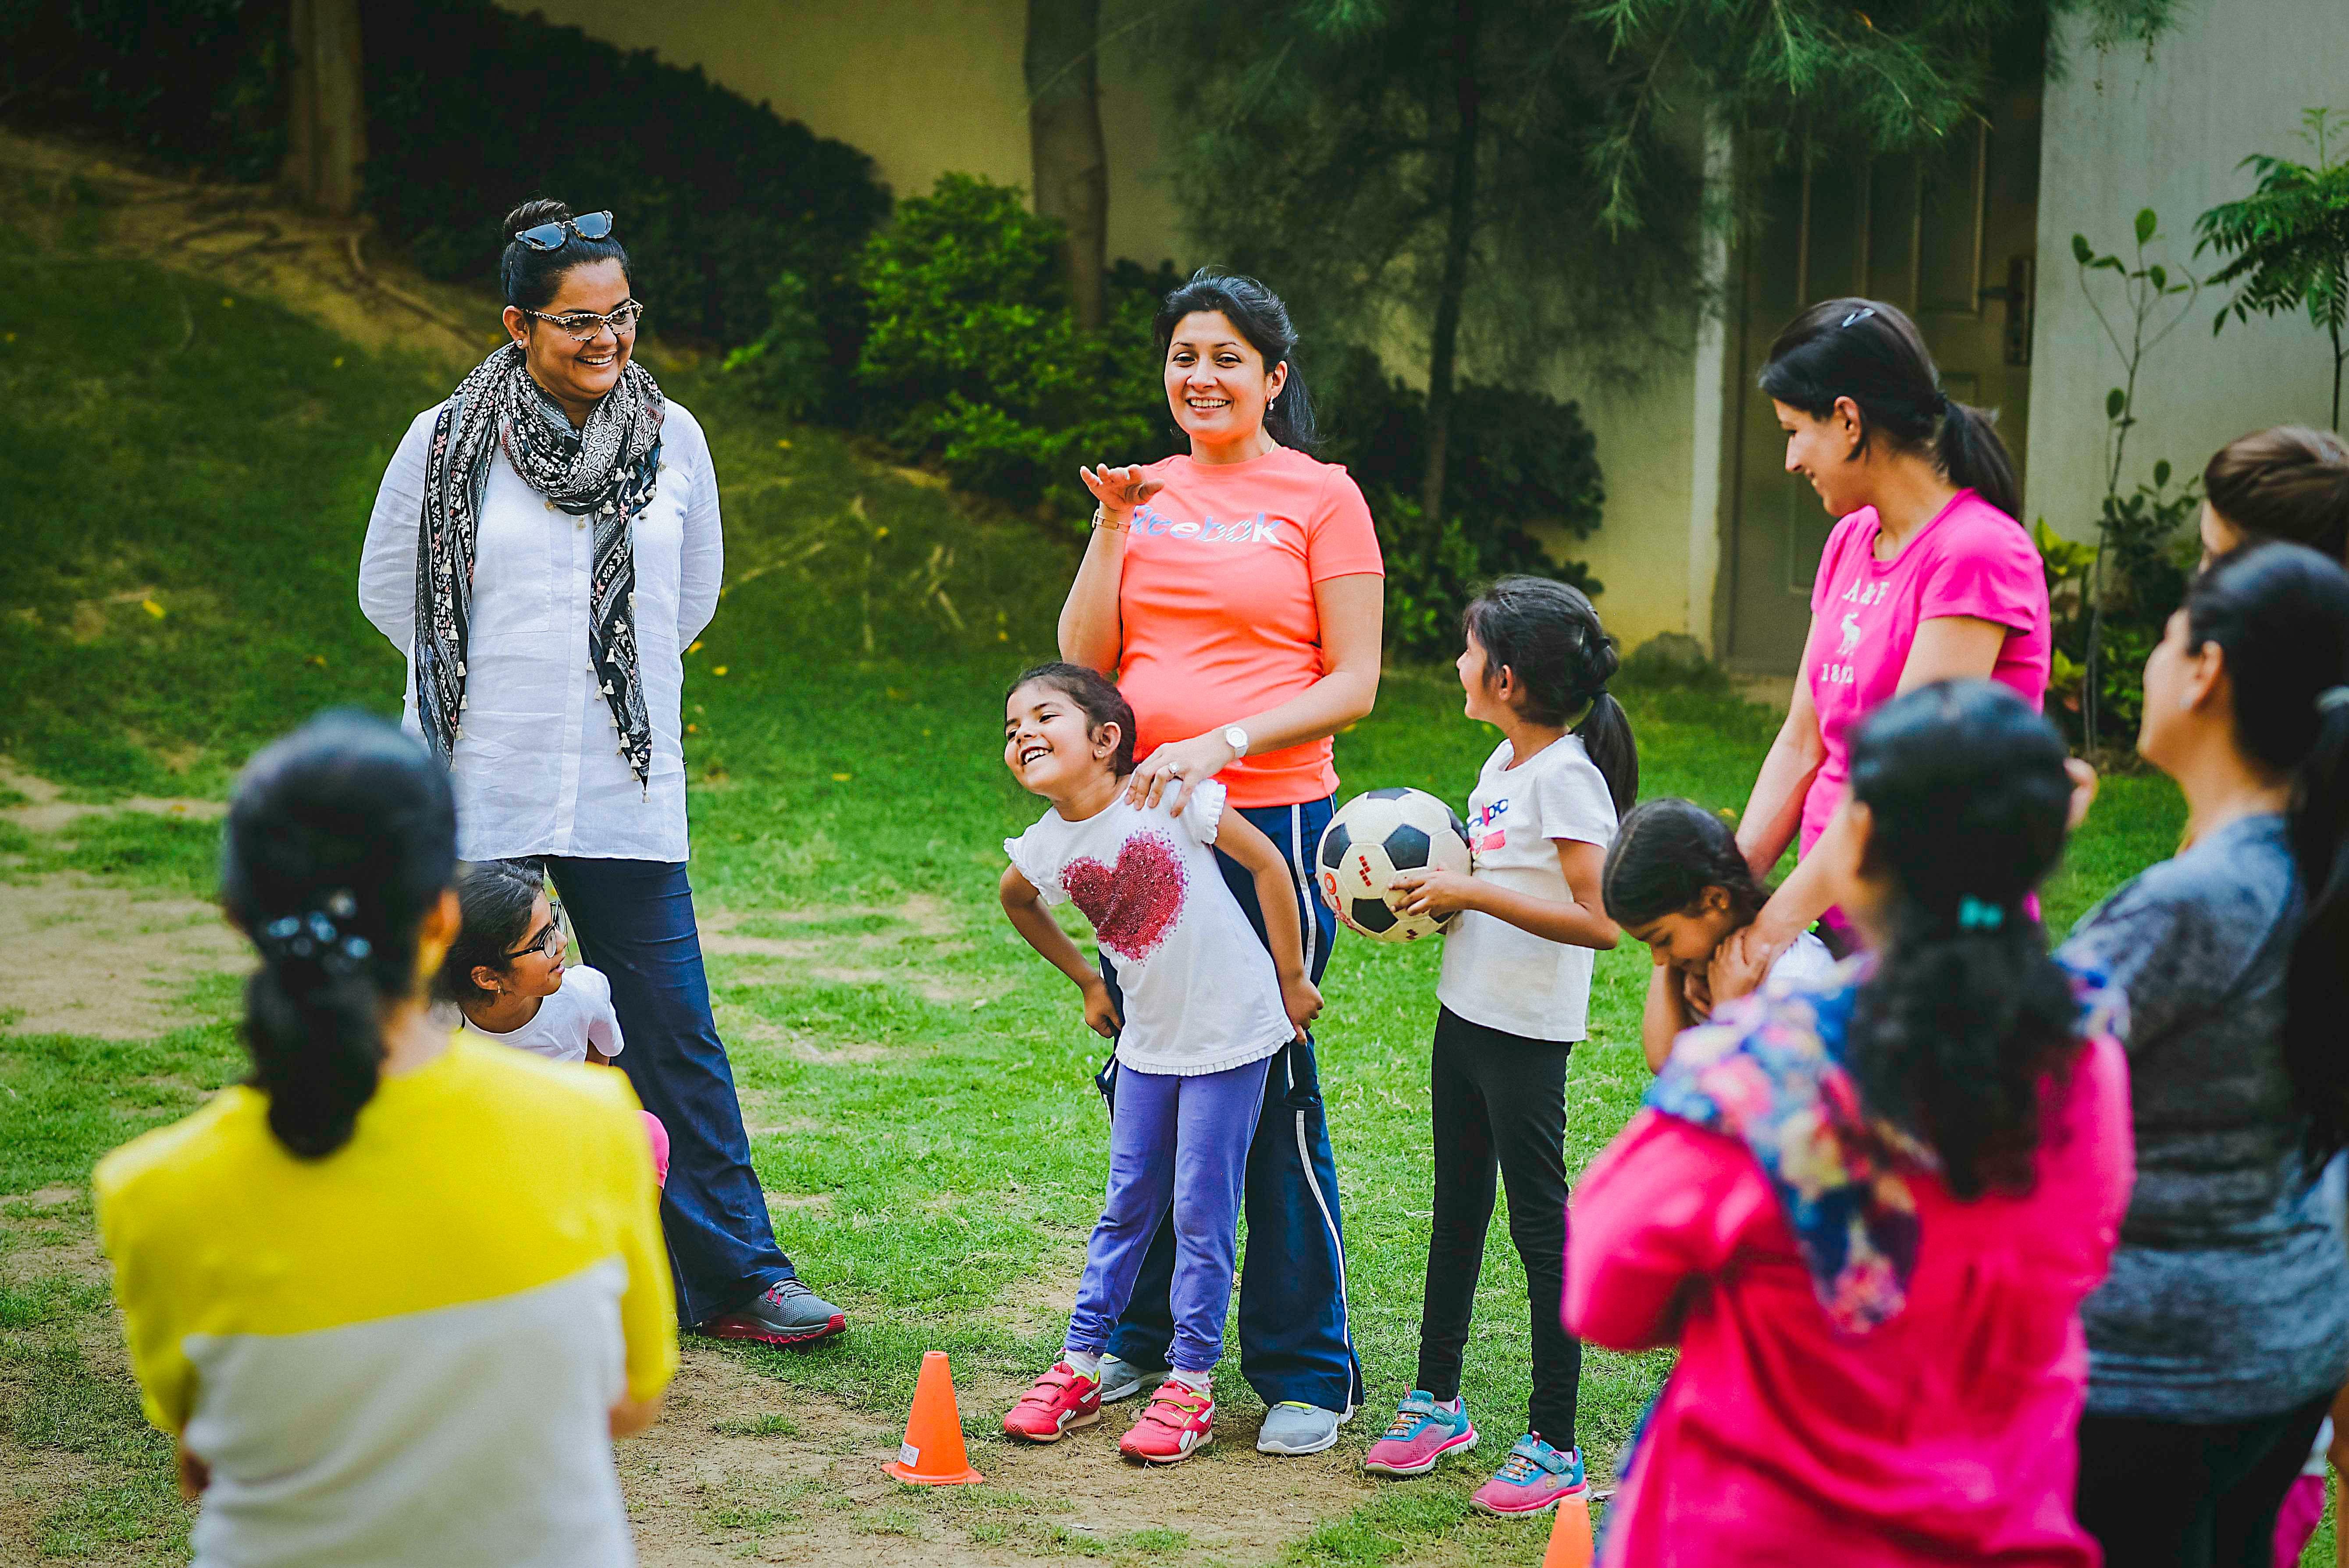 Nupur-Richard- The Art of Sport- Delhi- startup-empowering girls though sports